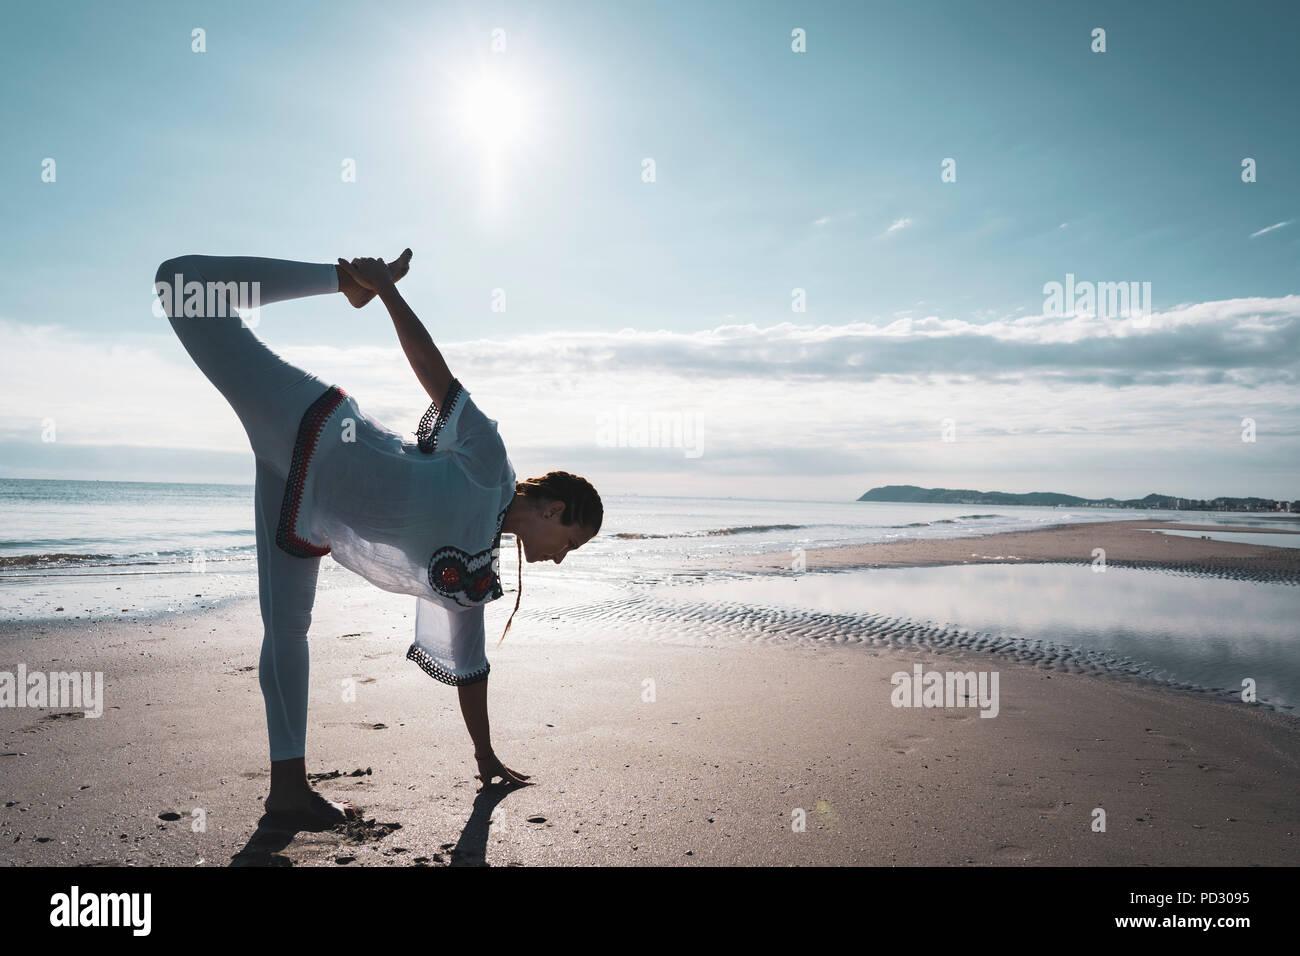 Woman practising yoga on beach - Stock Image